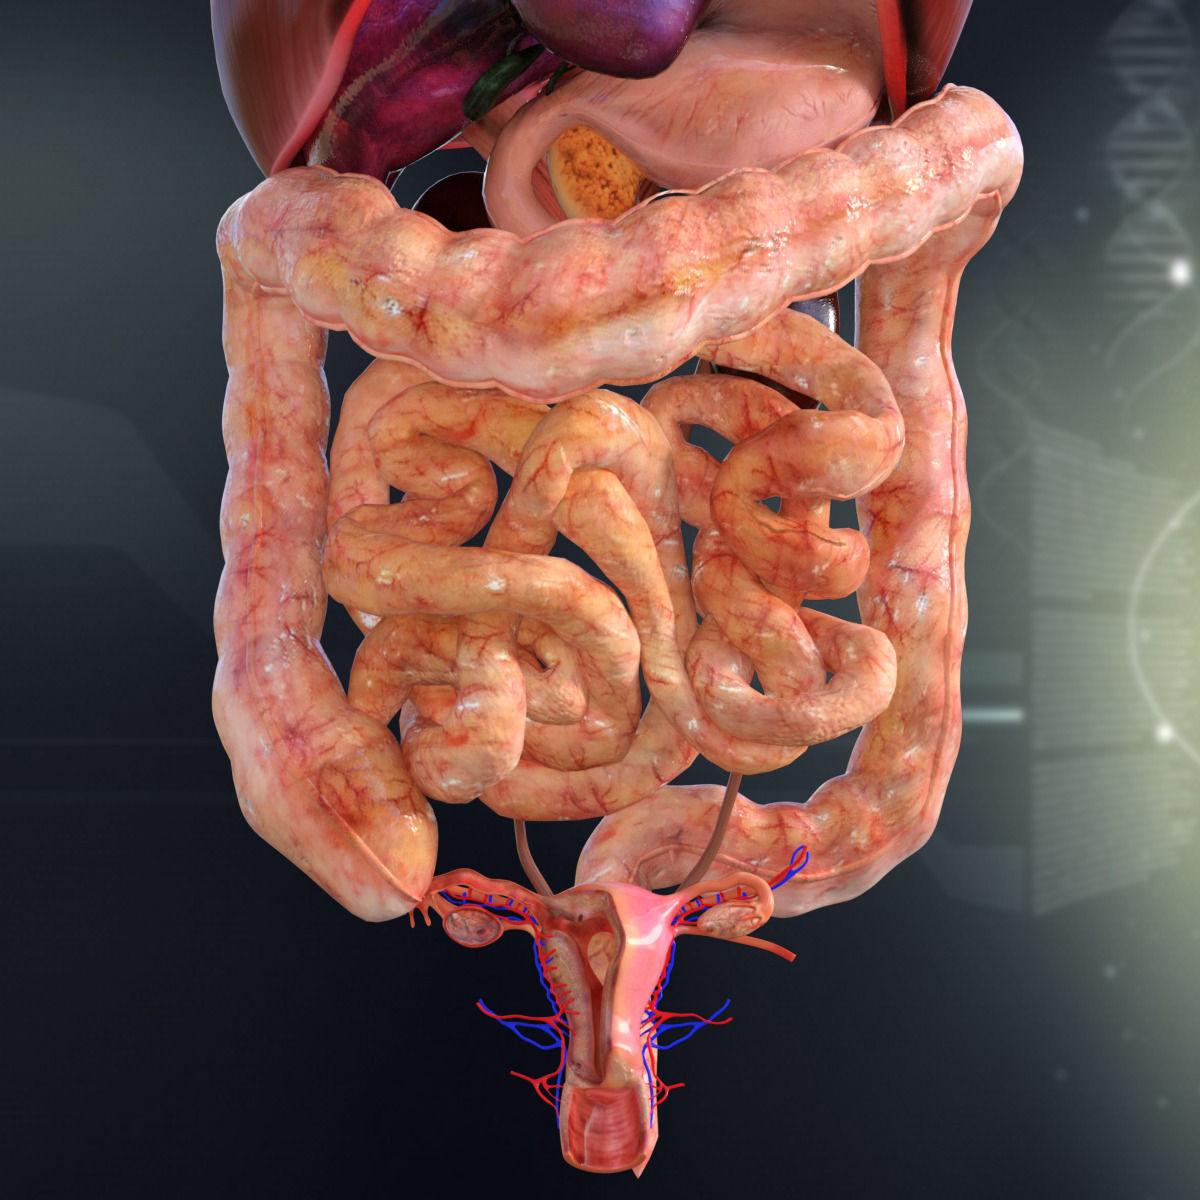 Human Female Internal Organs Anatomy 3D Model MAX OBJ 3DS ...